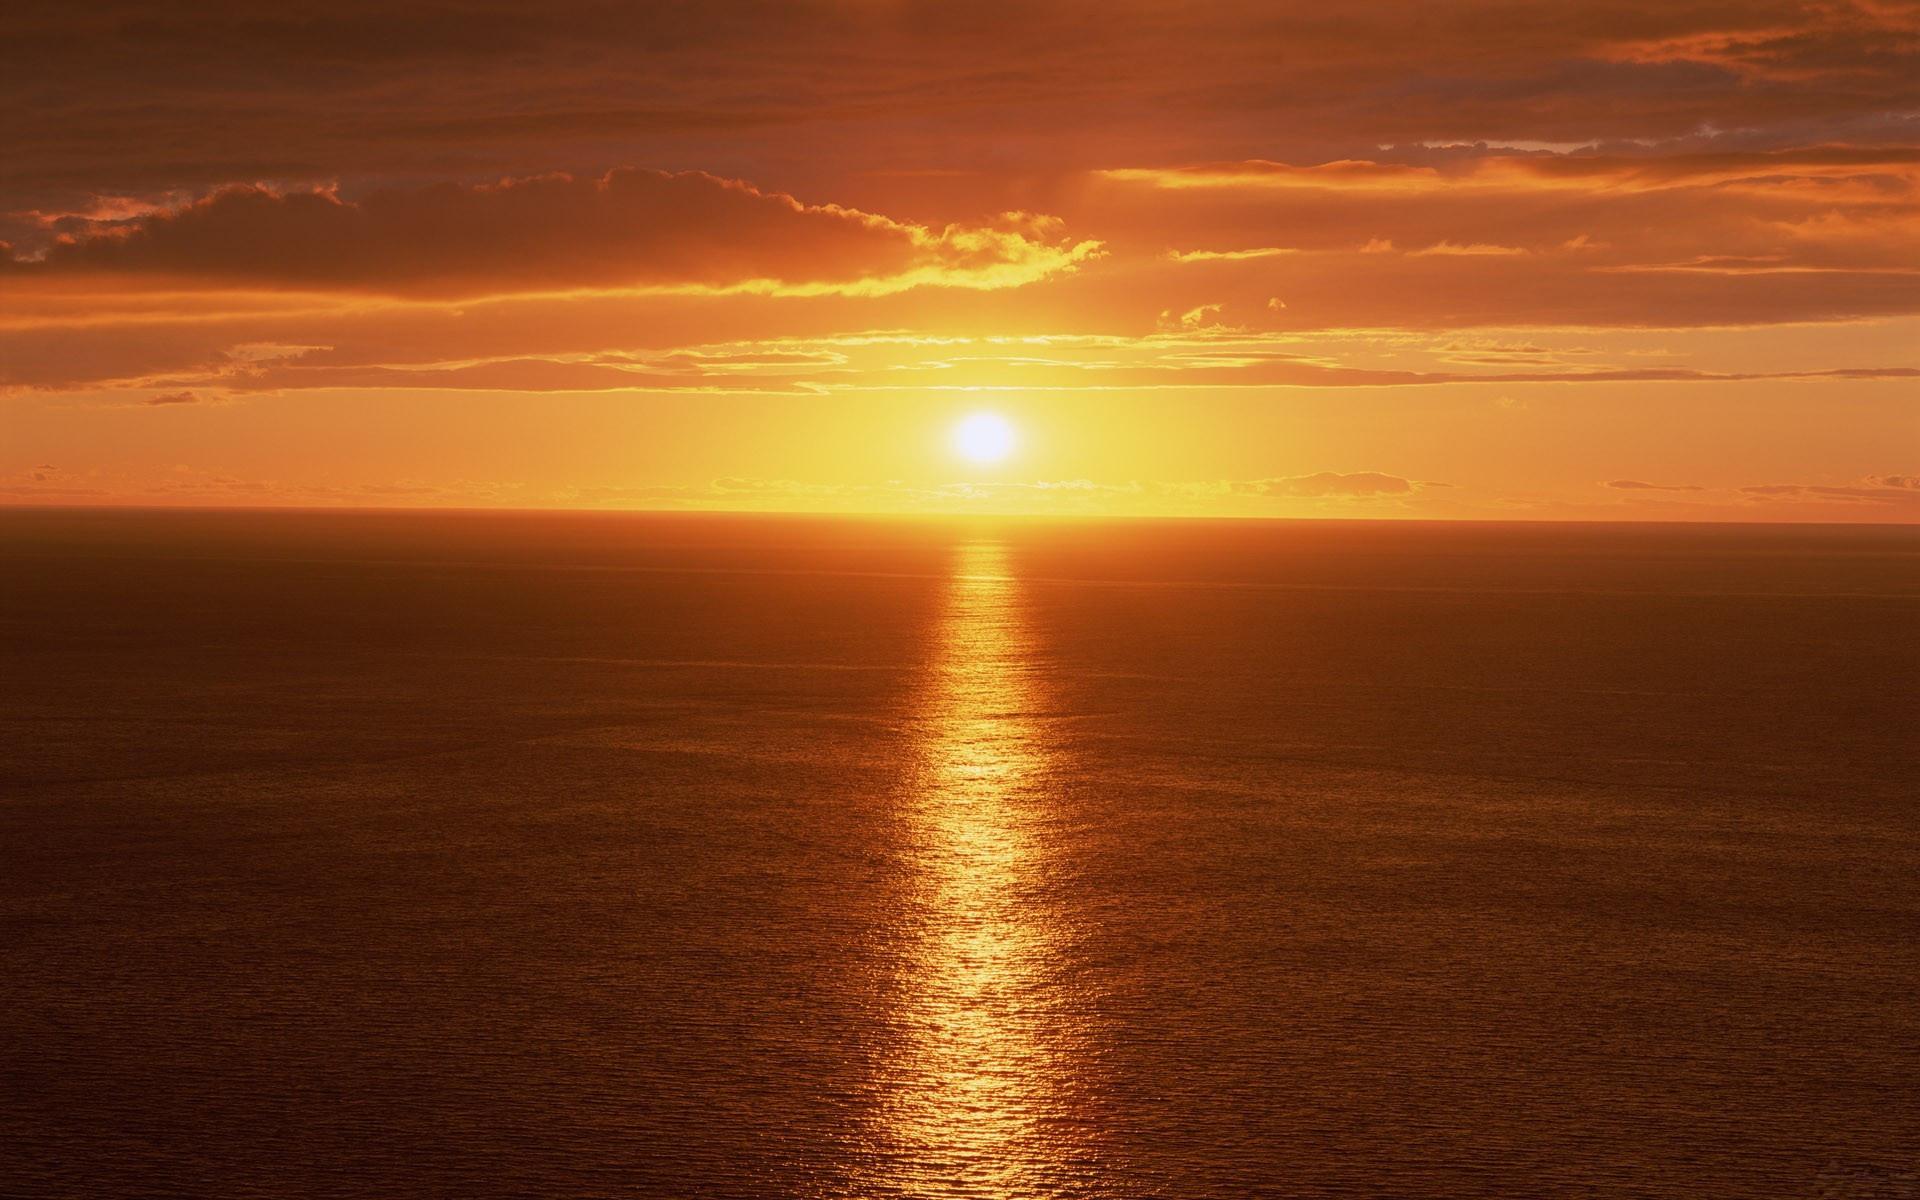 Море солнце лучи Sea the sun rays  № 1623258 загрузить